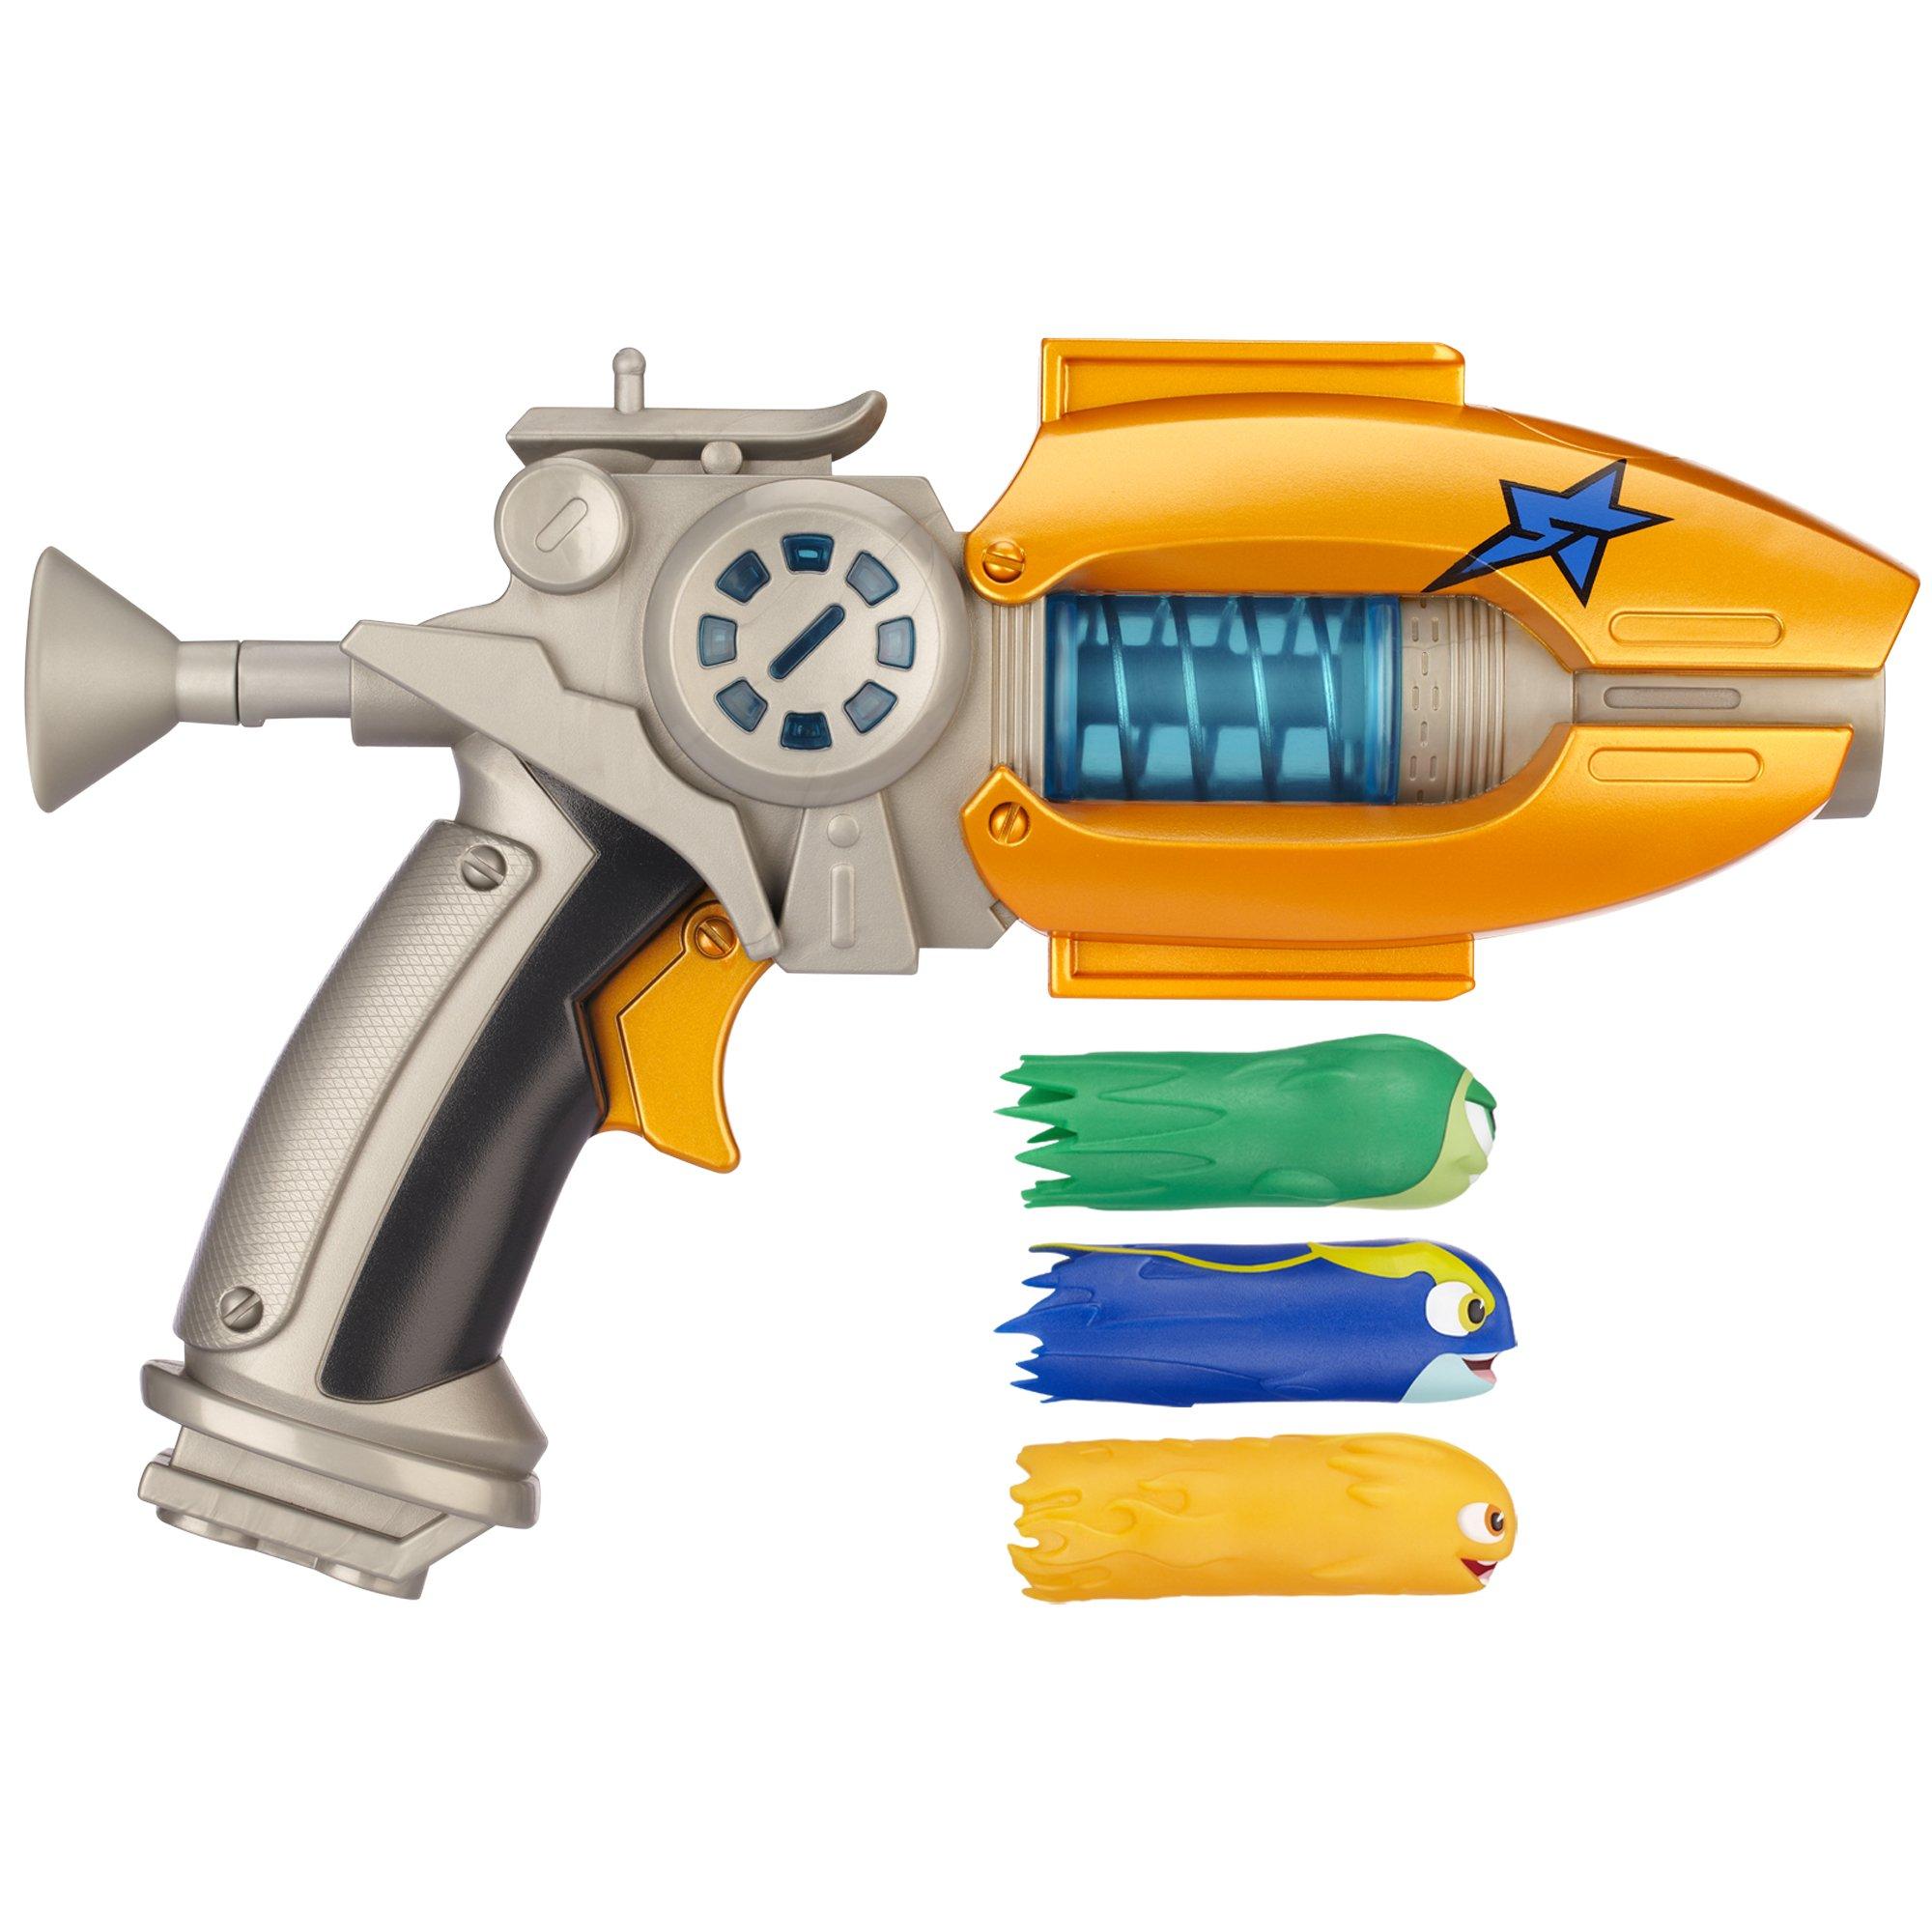 Slugterra Eli's Blaster 2.0 Defender Slipstream XVL with 3 Firing Slugs